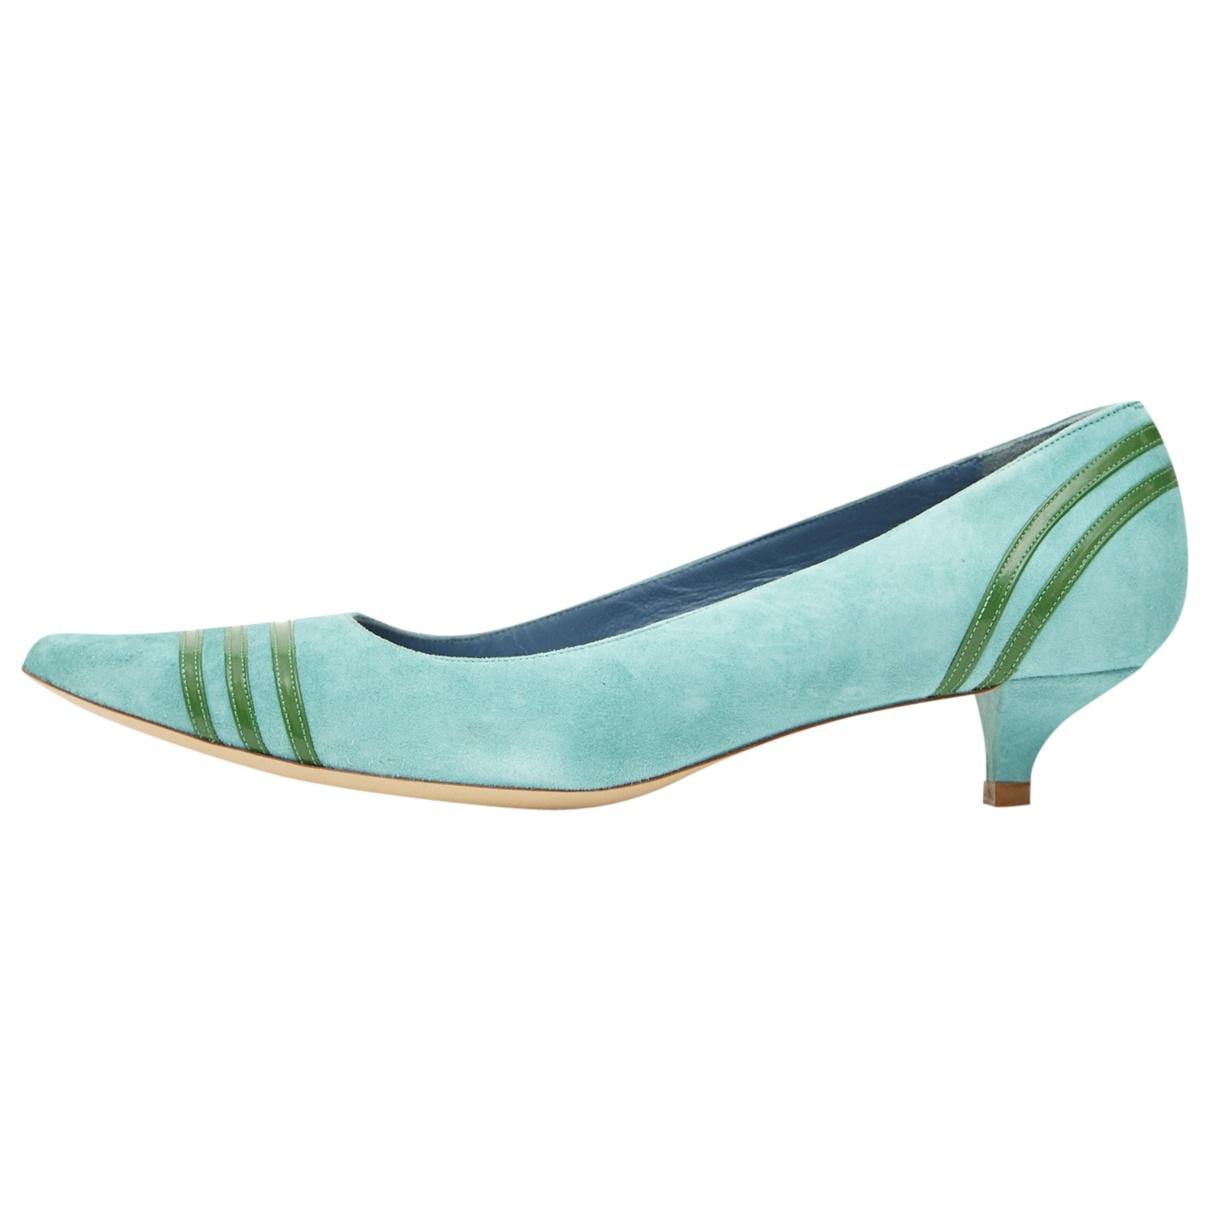 Marc Jacobs \N Green Suede Heels for Women 37.5 EU